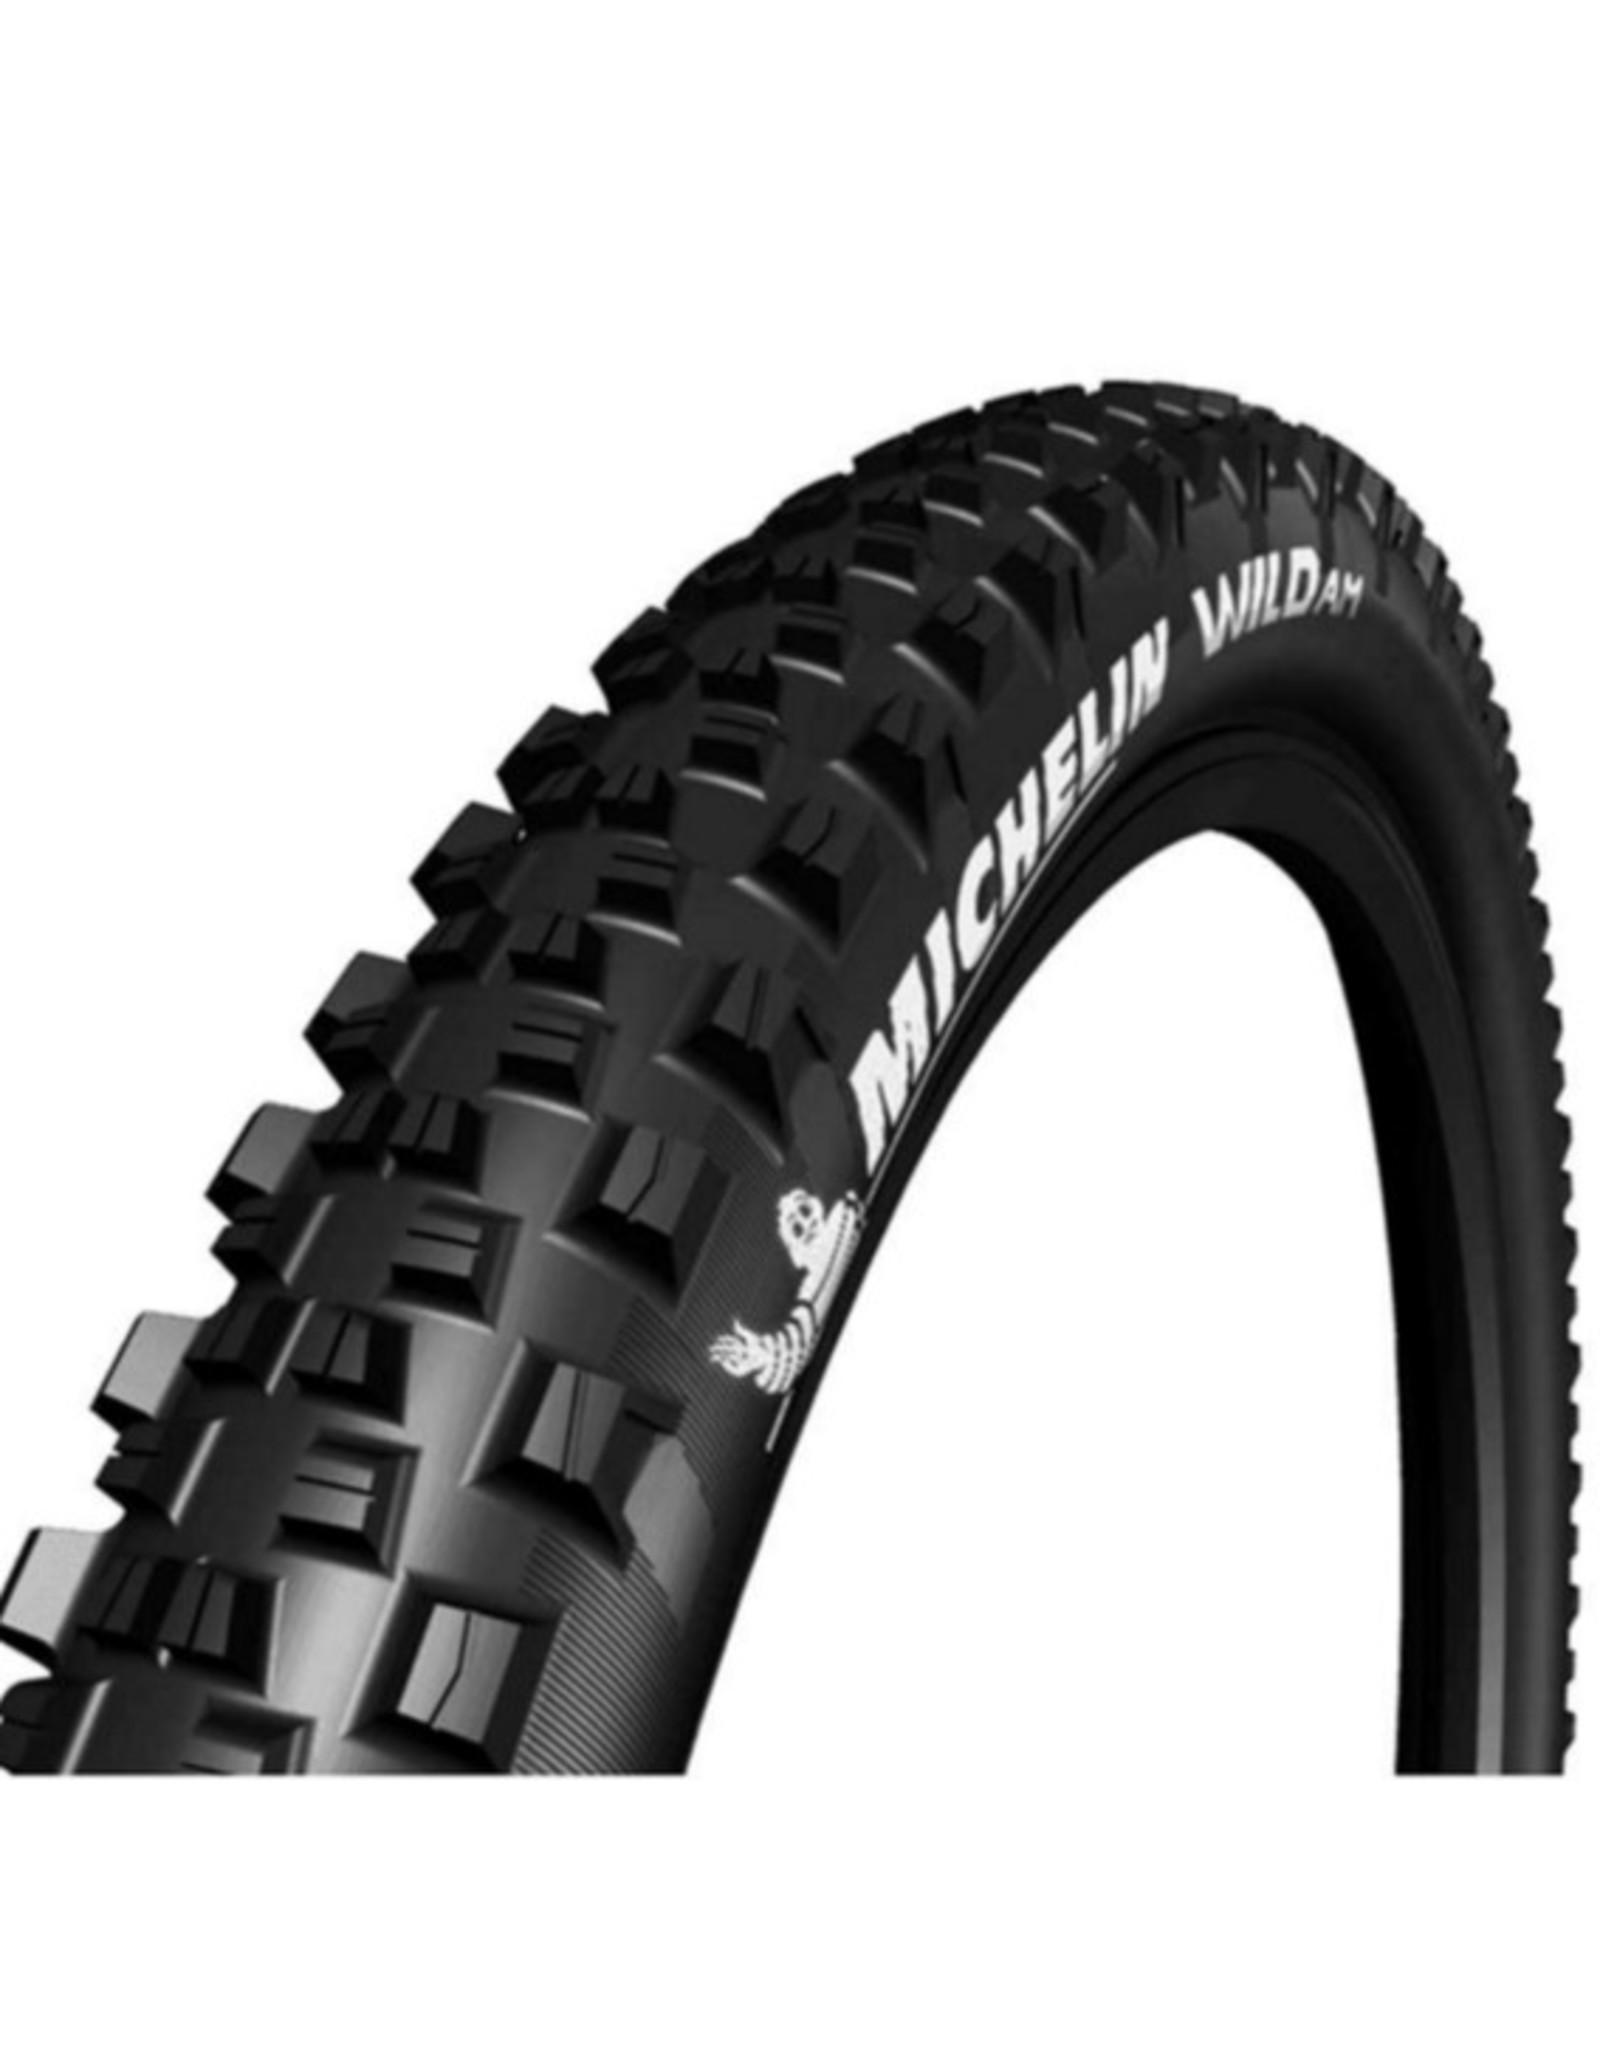 Michelin, Wild AM, 29''x2.35, Pliable, GUM-X, Noir